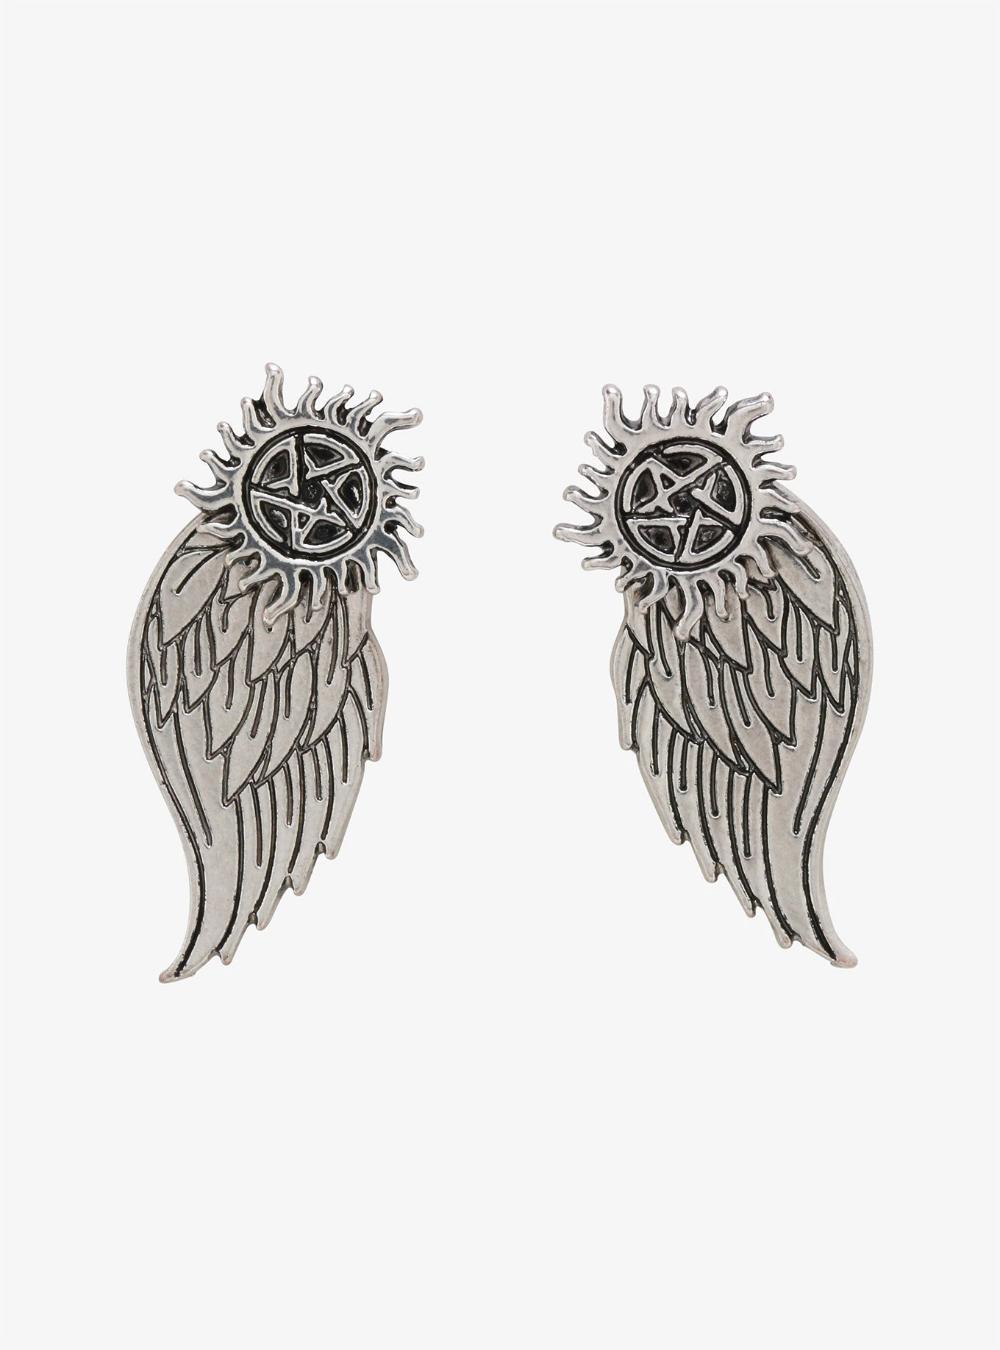 Supernatural AntiPossession Castiel Wings Front/Back